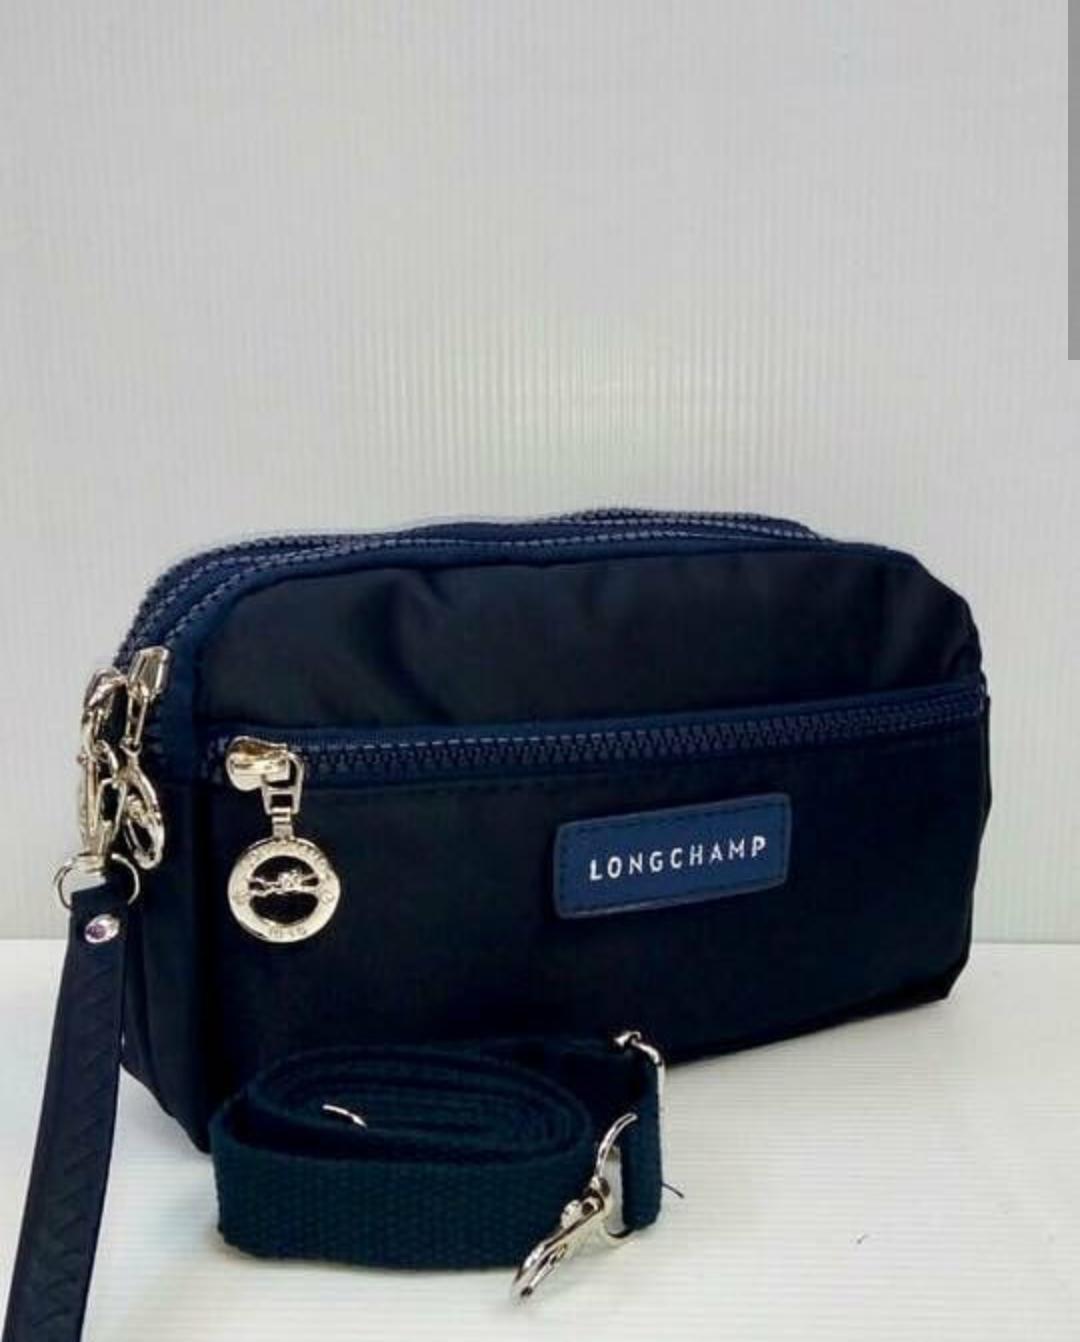 Harga Tas Longchamp Kw Terbaru 2018 Murah Le Pliage Neo Backpack Fantaisie M Merah Dompet Wanita Remaja Bonus Tali Panjang